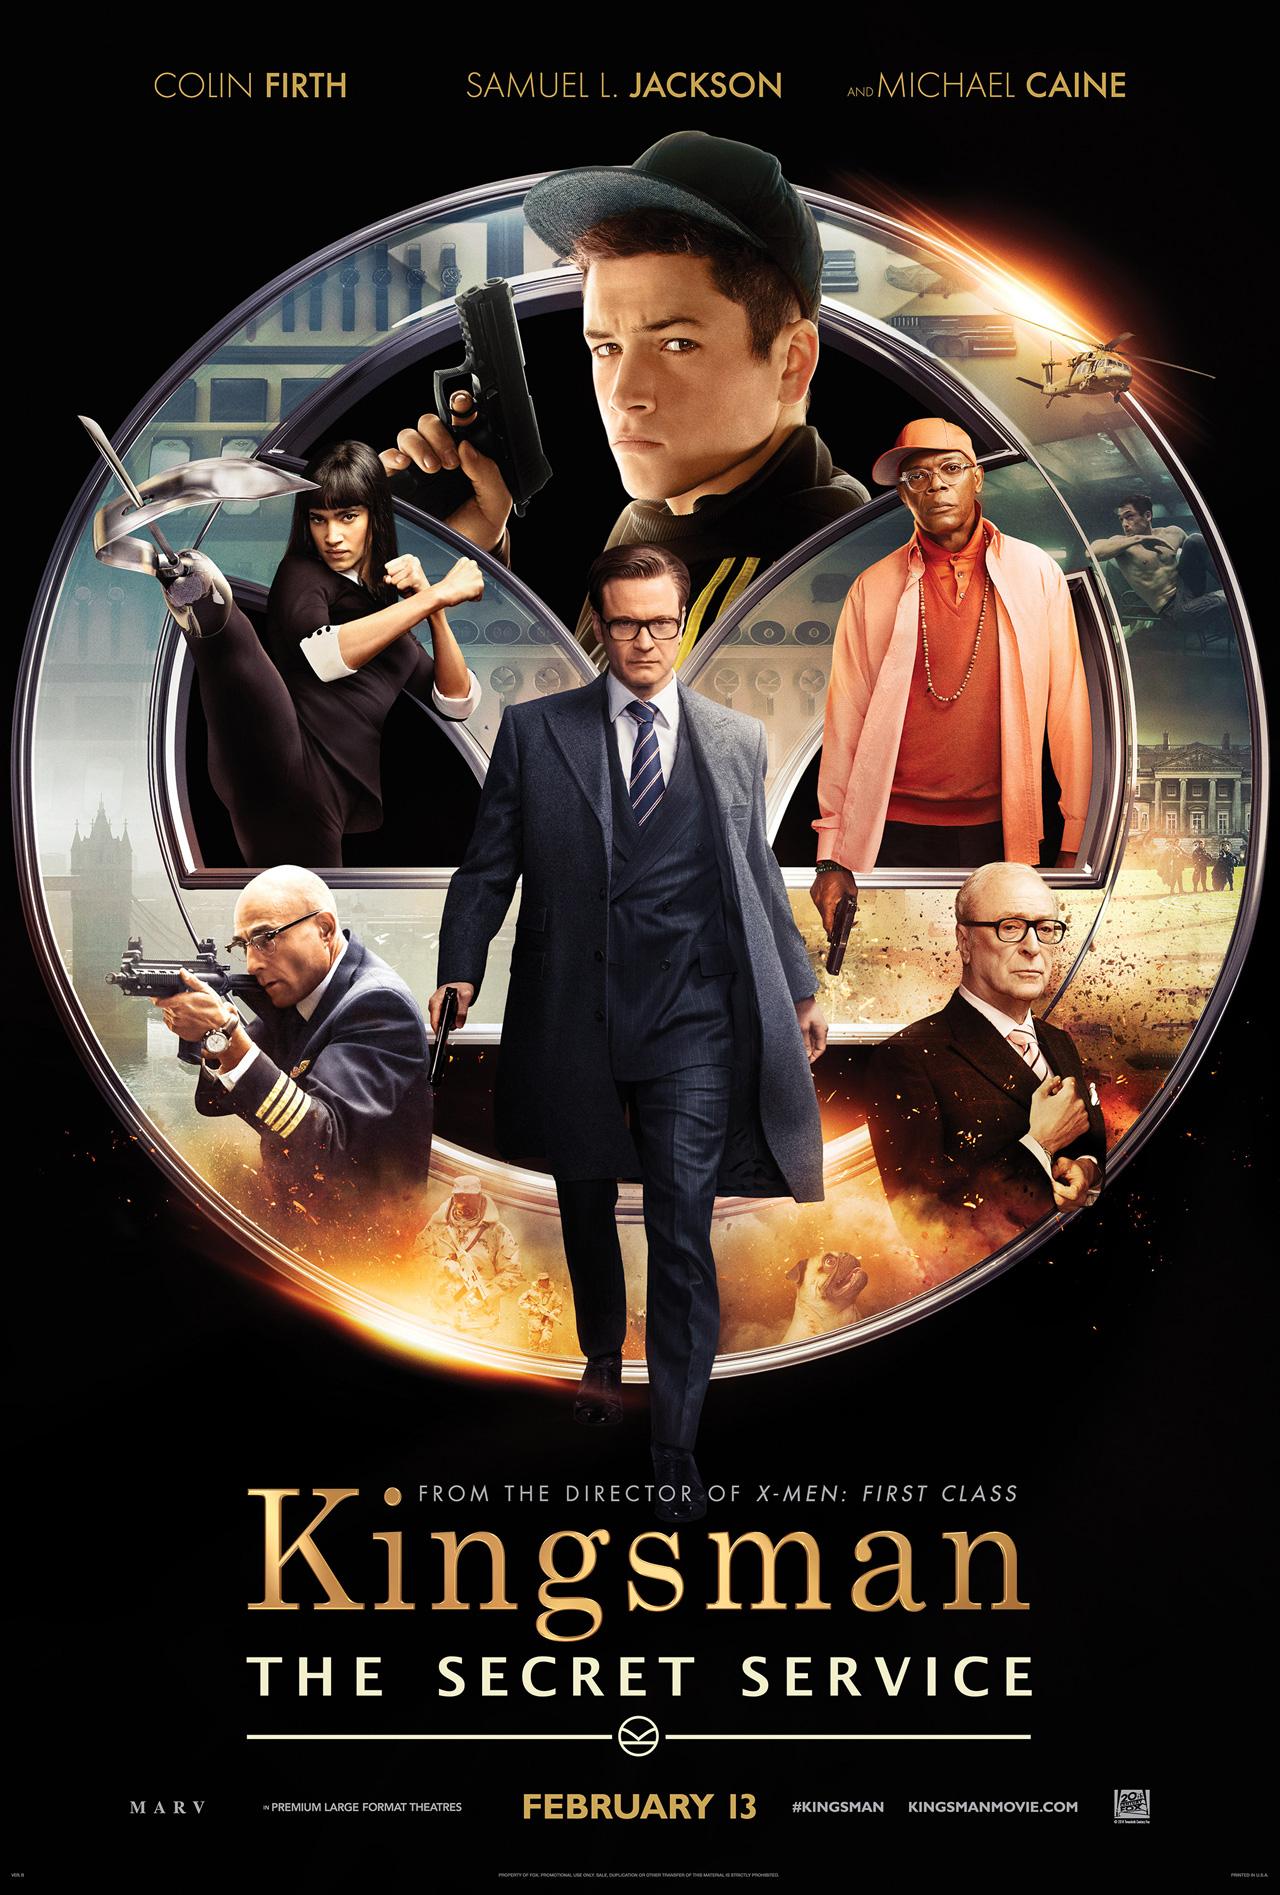 Kingsman-the-secret-service-2015-Film